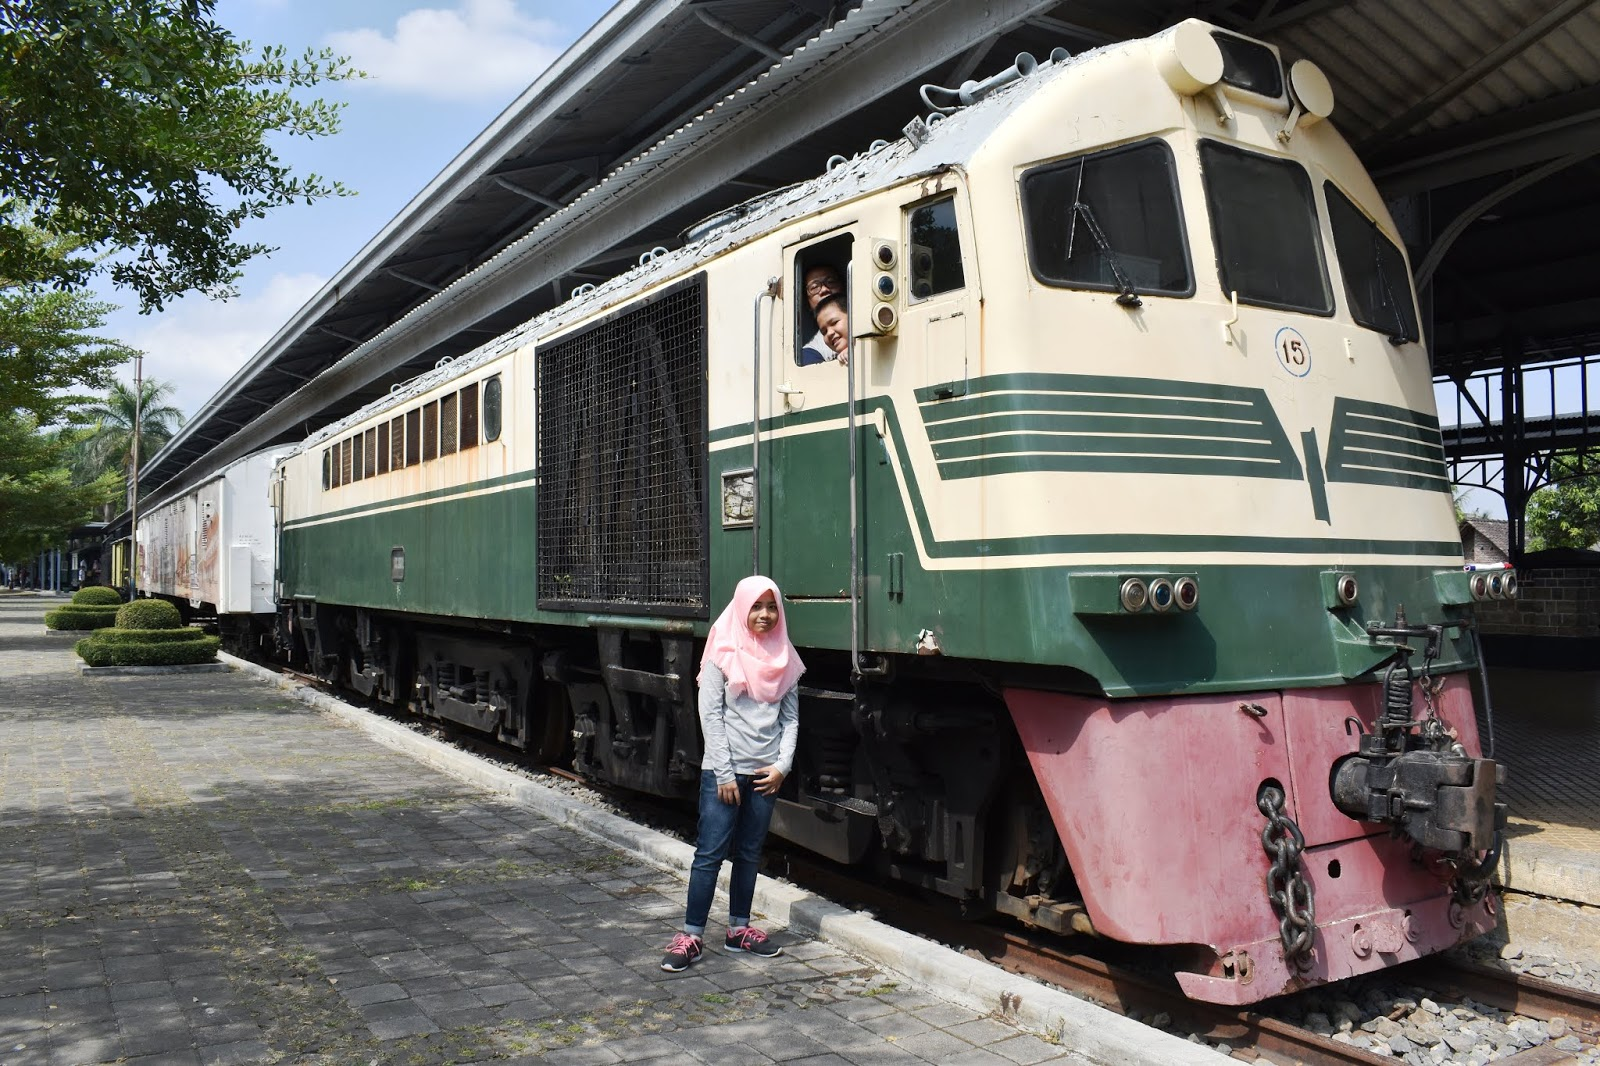 Wisata museum kereta ambarawa